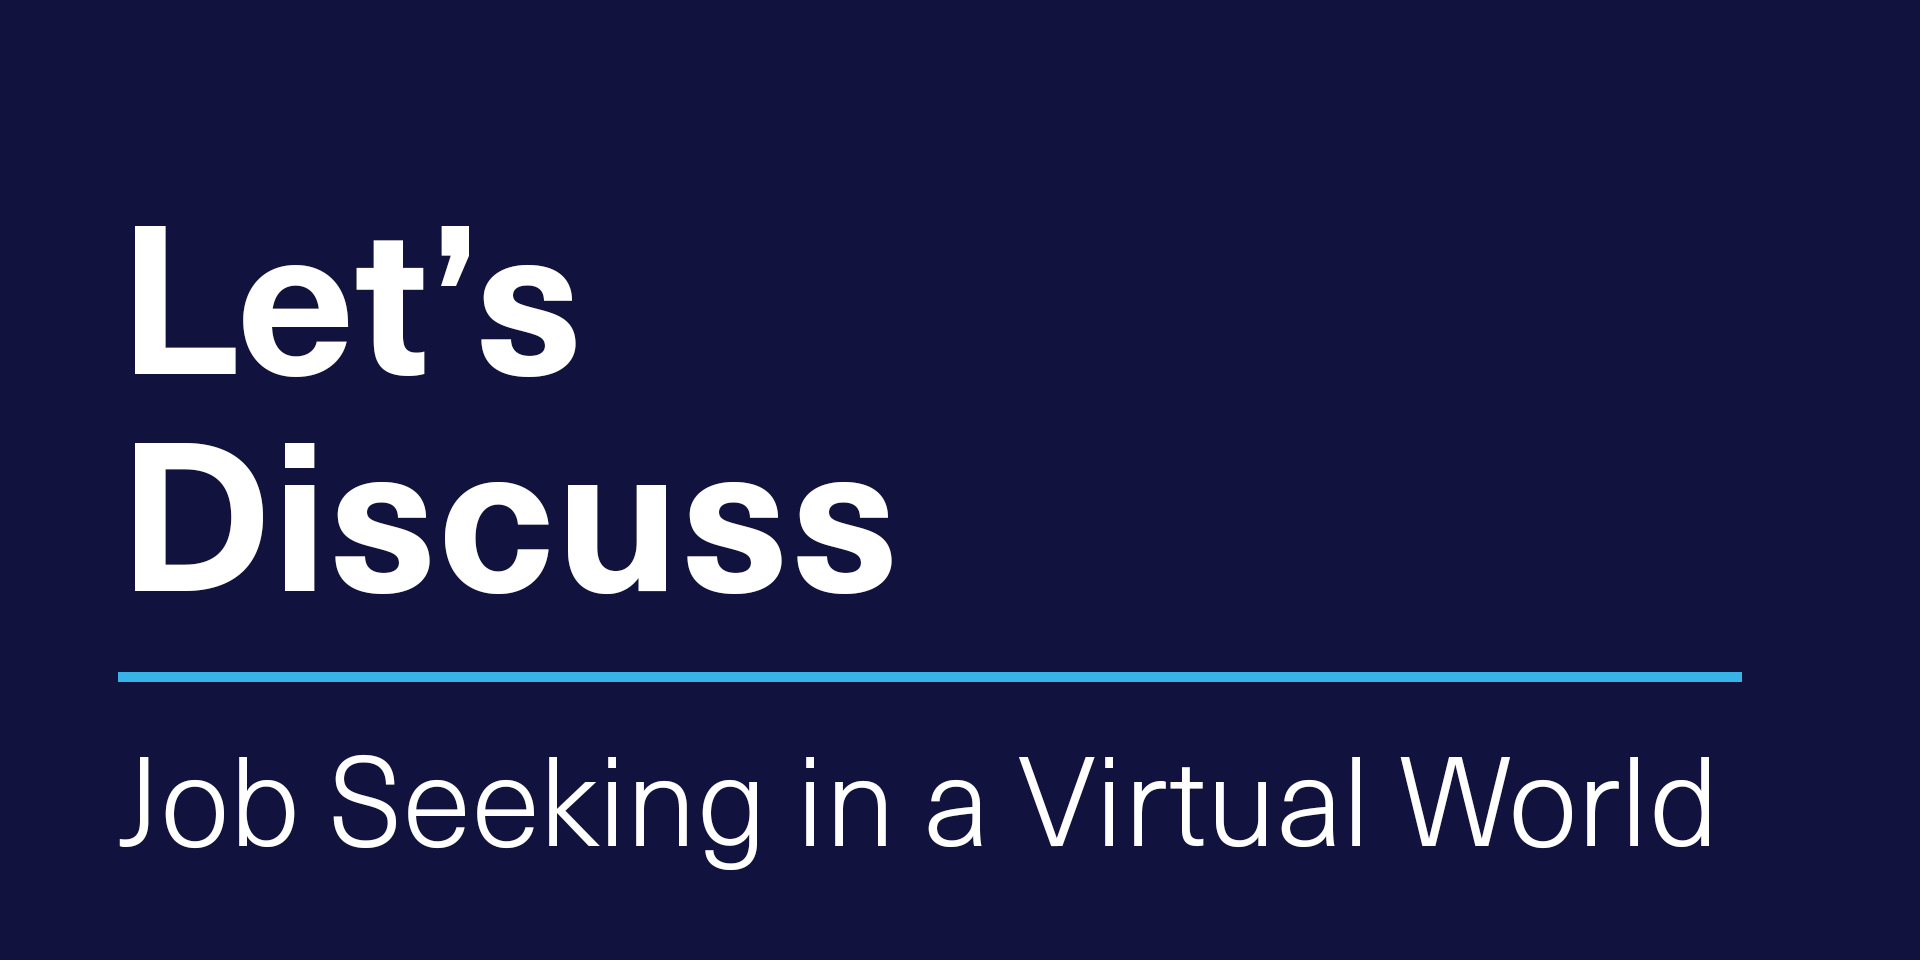 [VIRTUAL] Let's Discuss | Job Seeking in a Virtual World